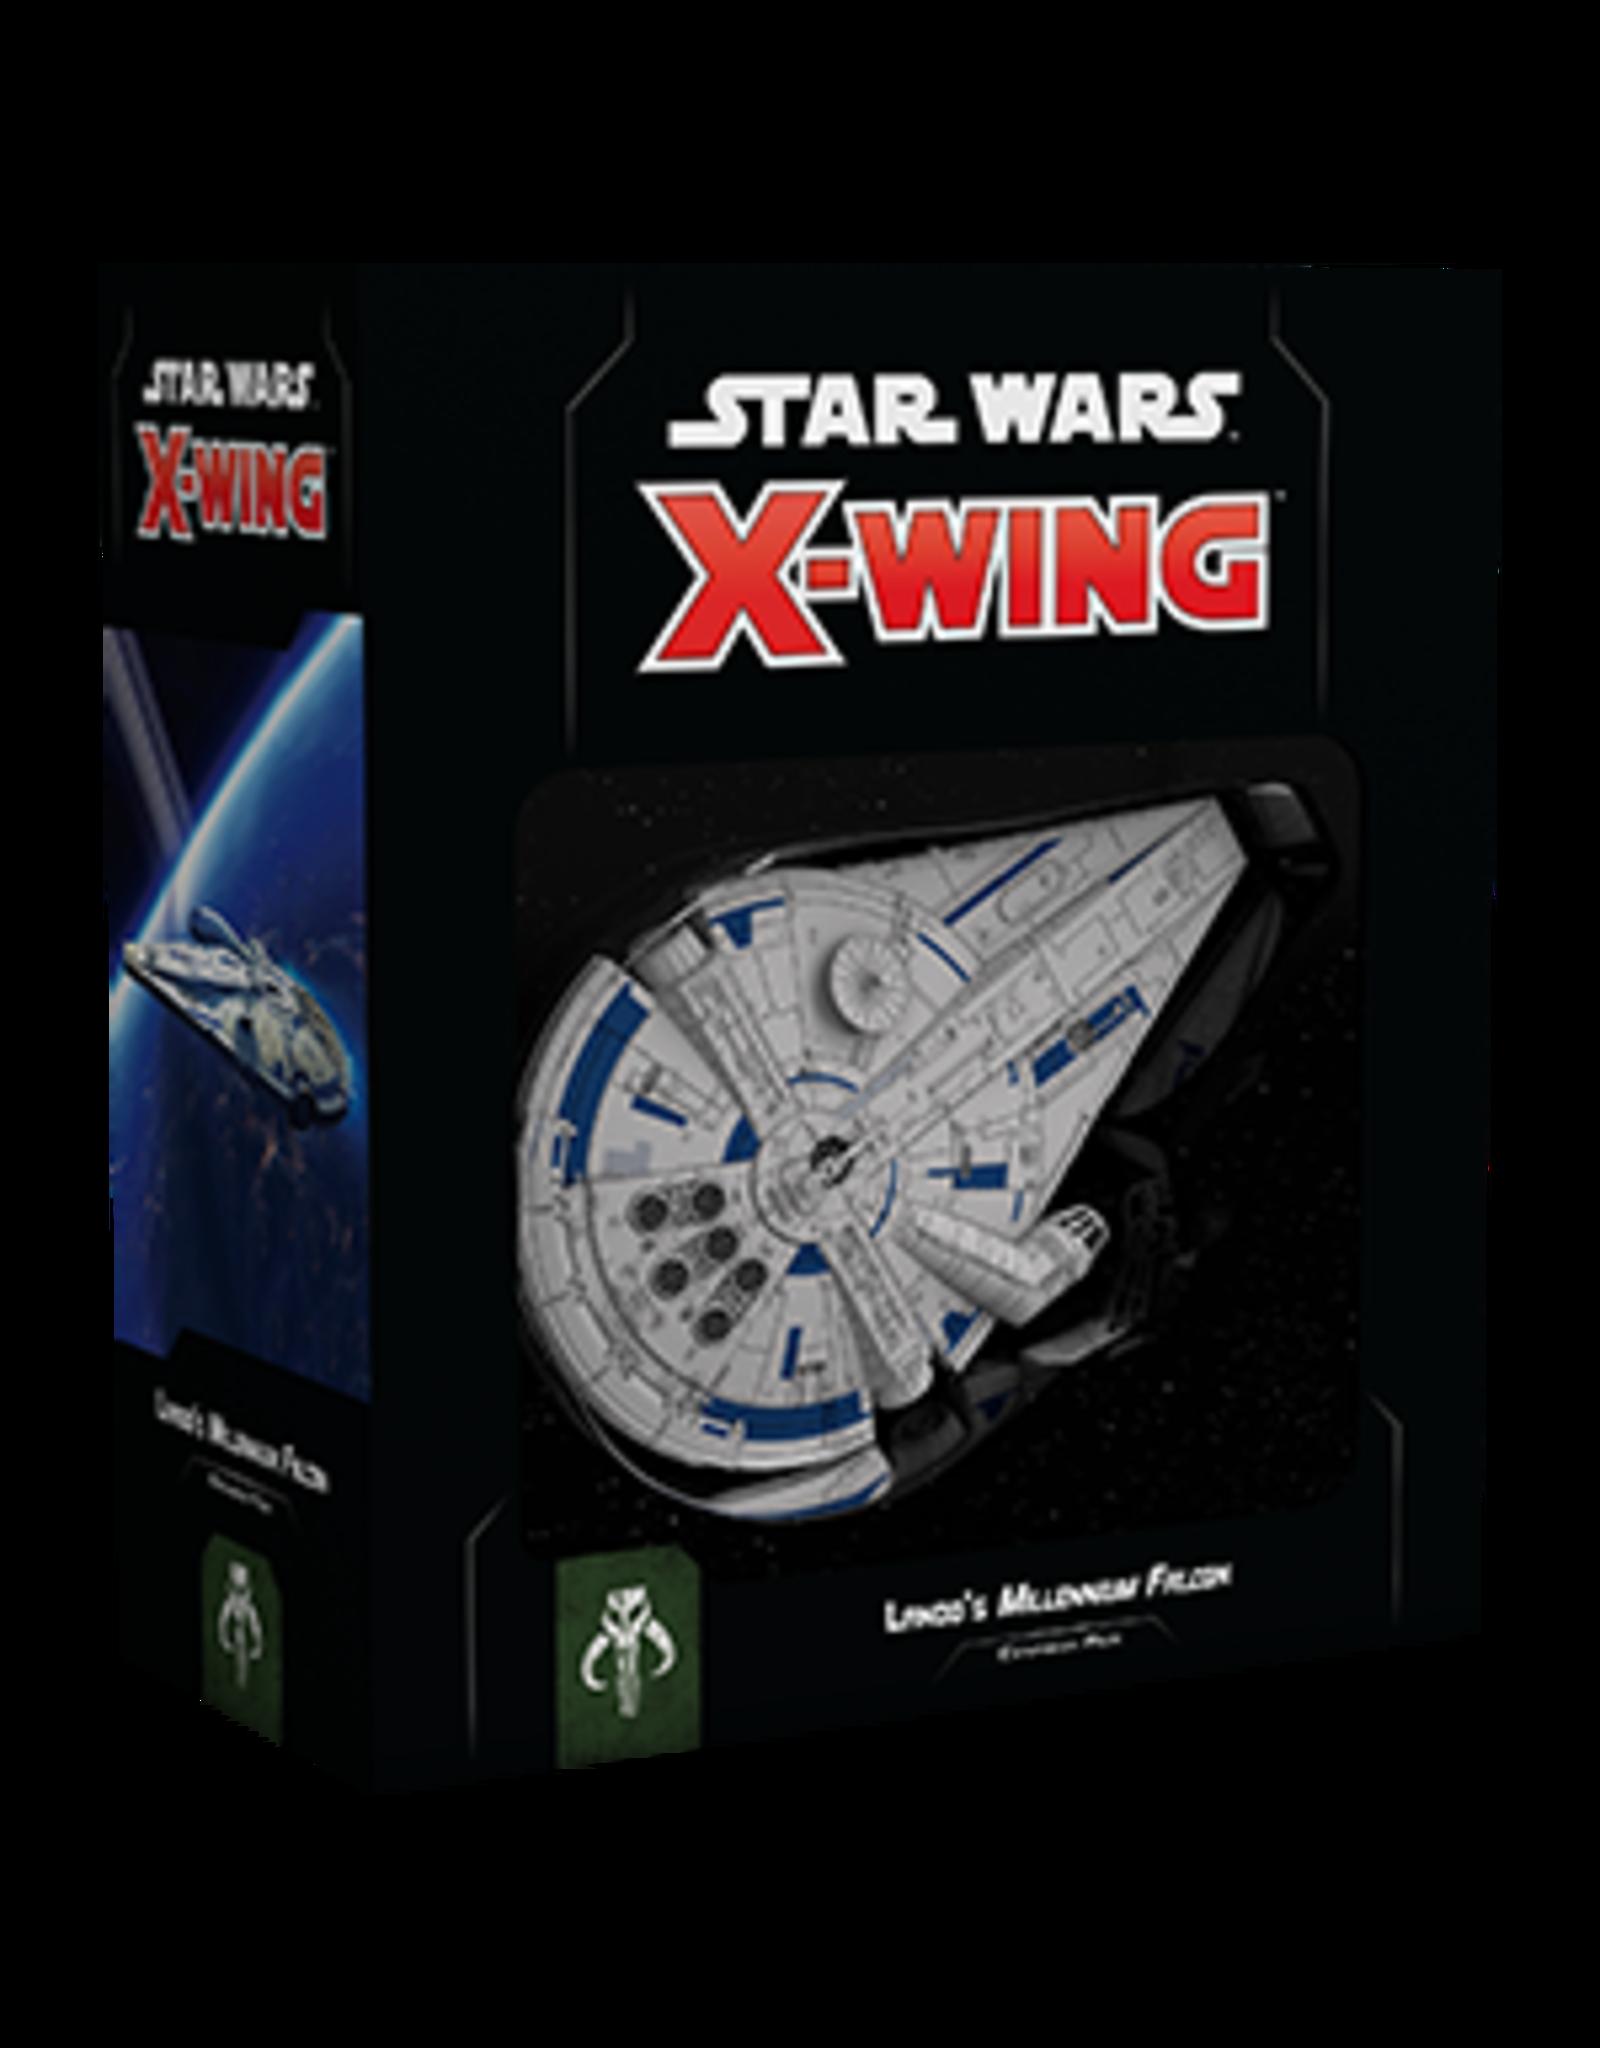 Fantasy Flight Games Star Wars X-Wing: 2nd Edition - Lando`s Millennium Falcon Expansion Pack